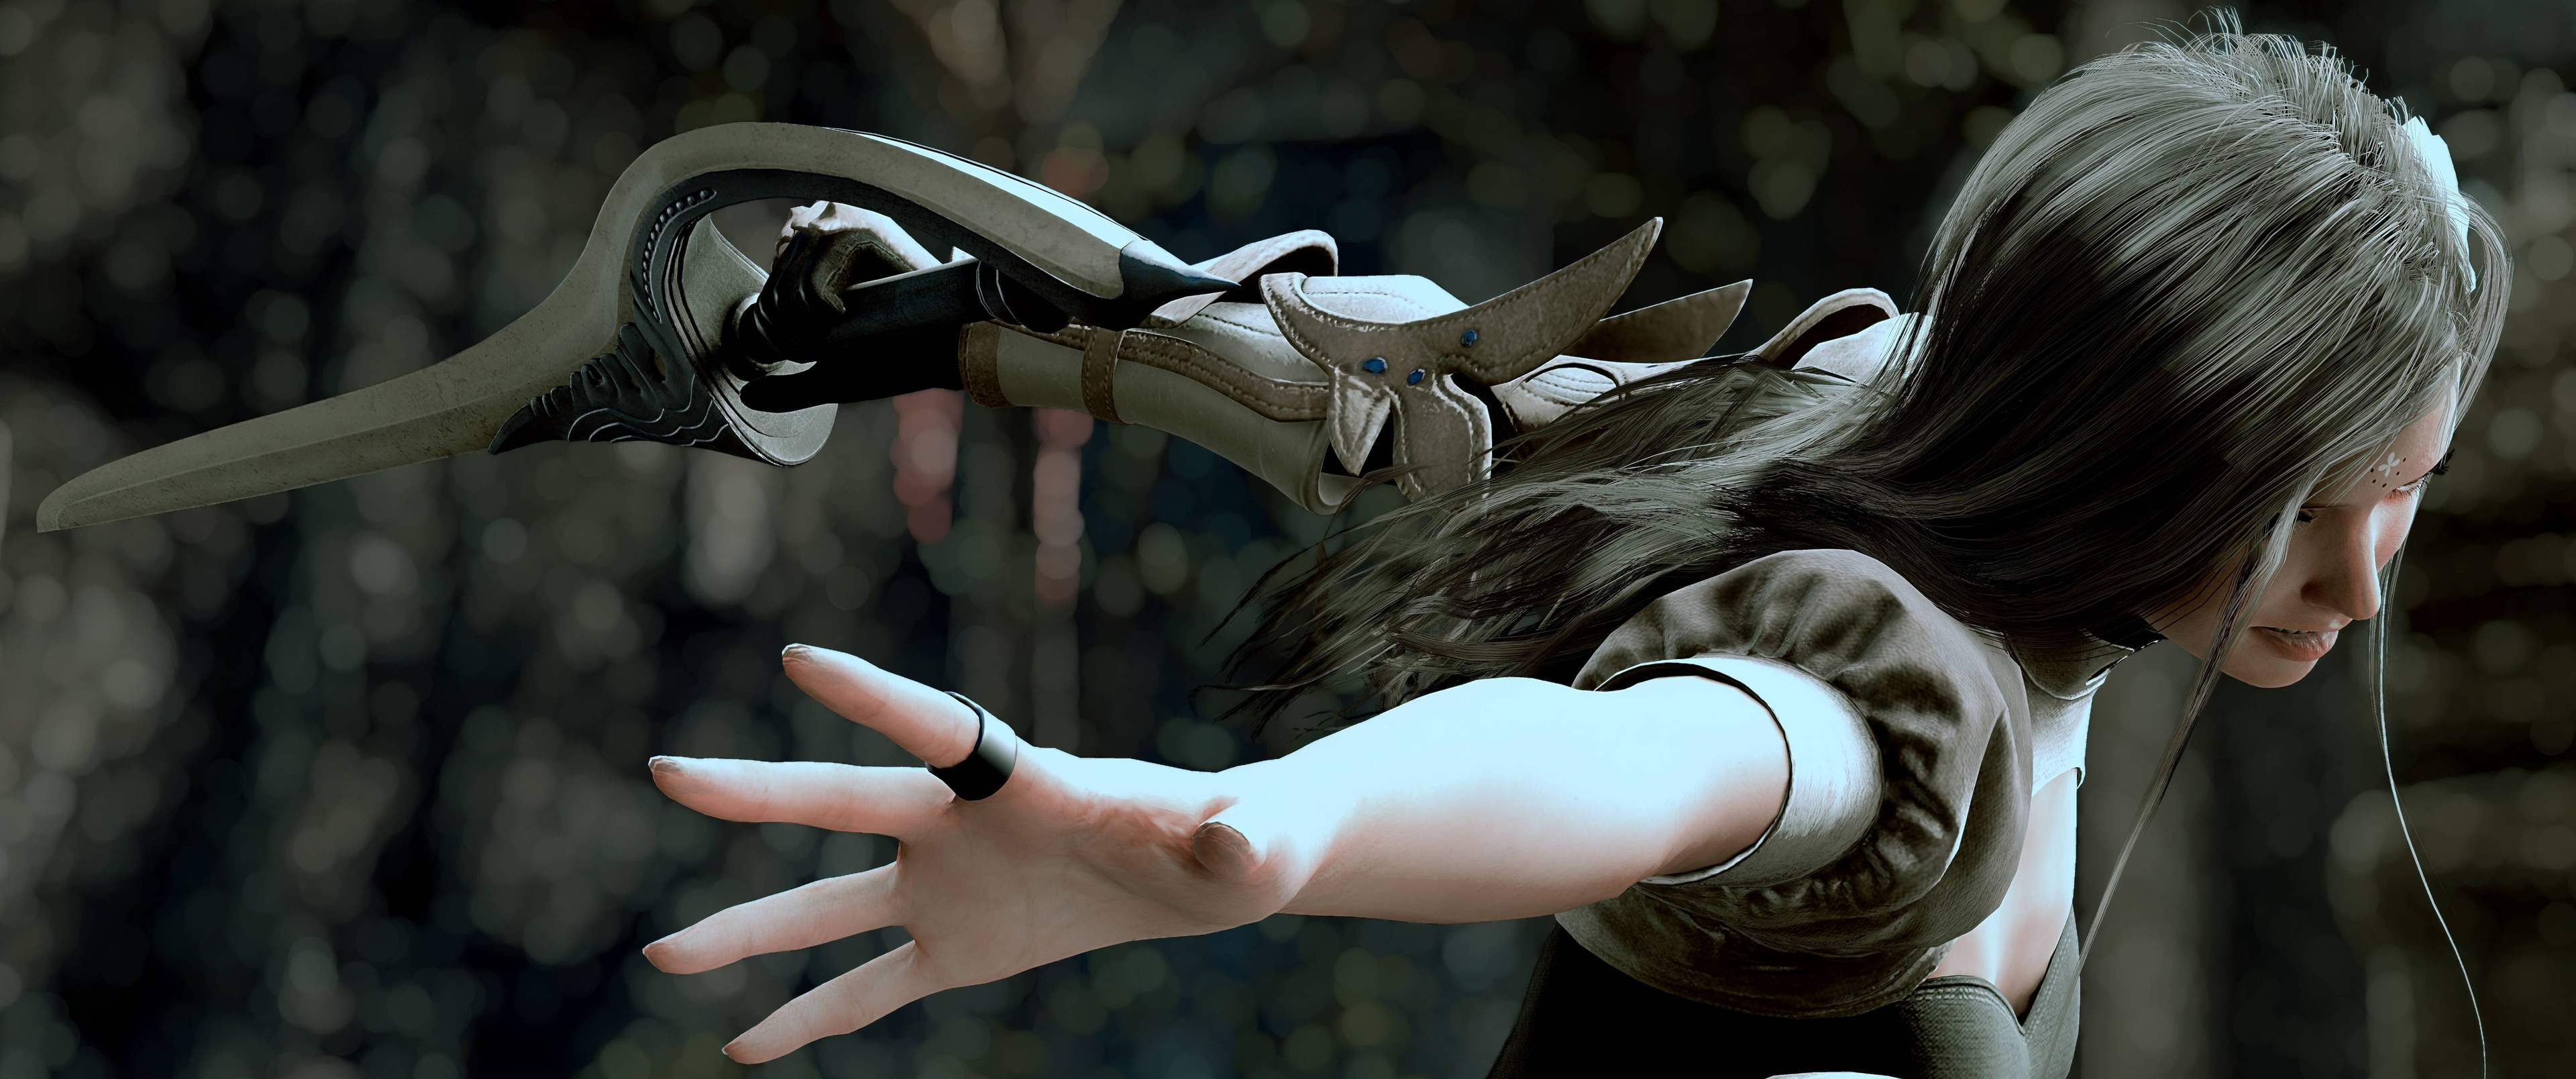 Final Fantasy 15 Windows Edition скриншот с NVIDIA Ansel - Final Fantasy 15